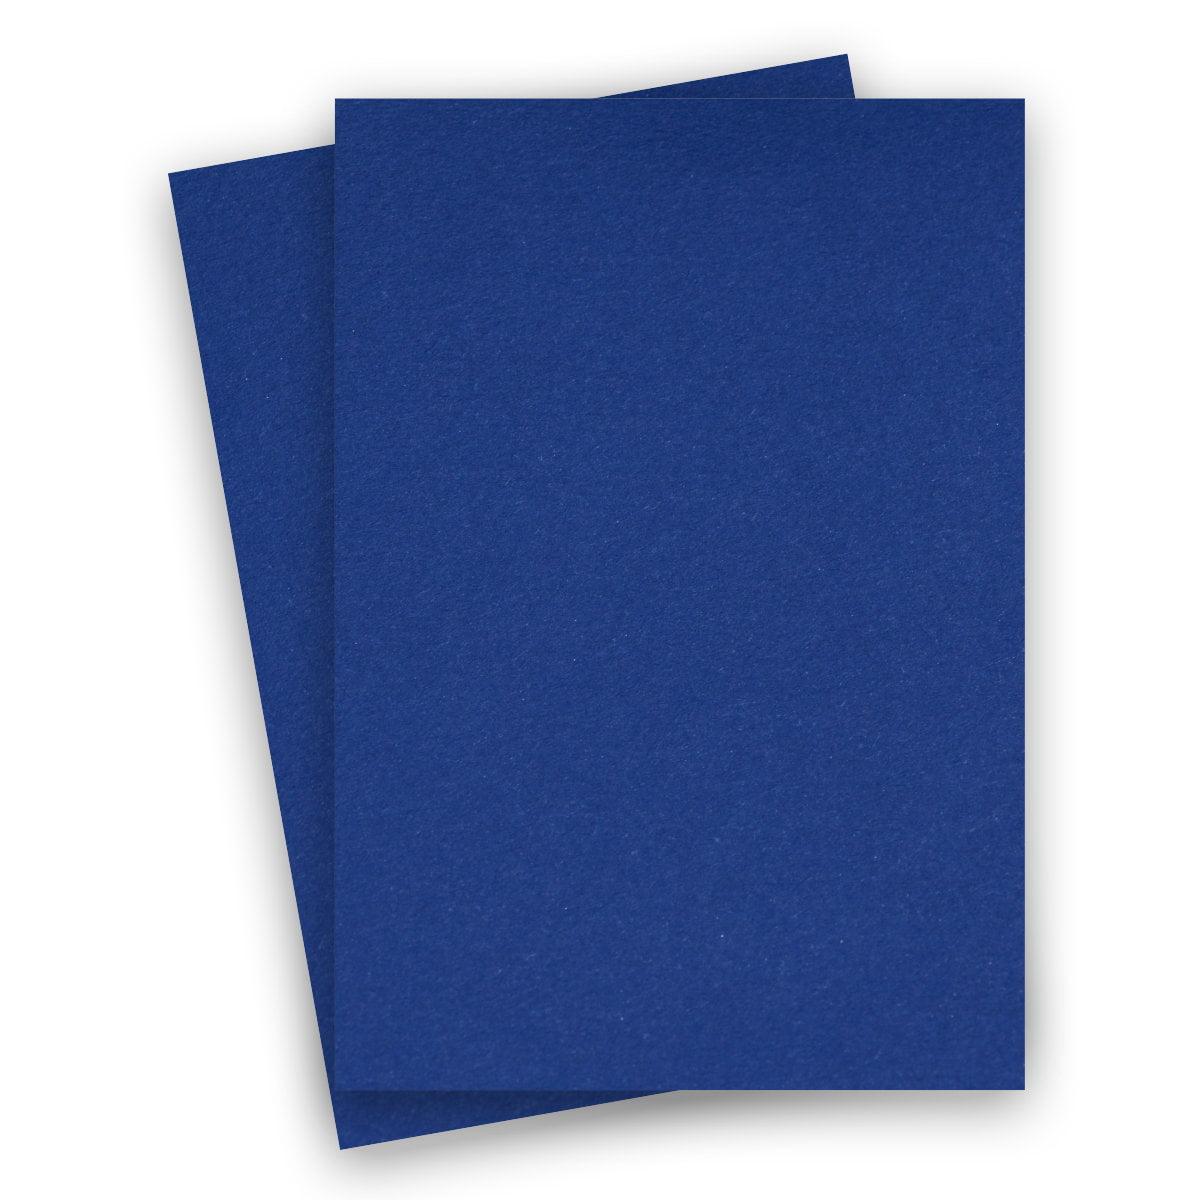 basics blue 85x14 legal paper 80c cardstock  100 pk